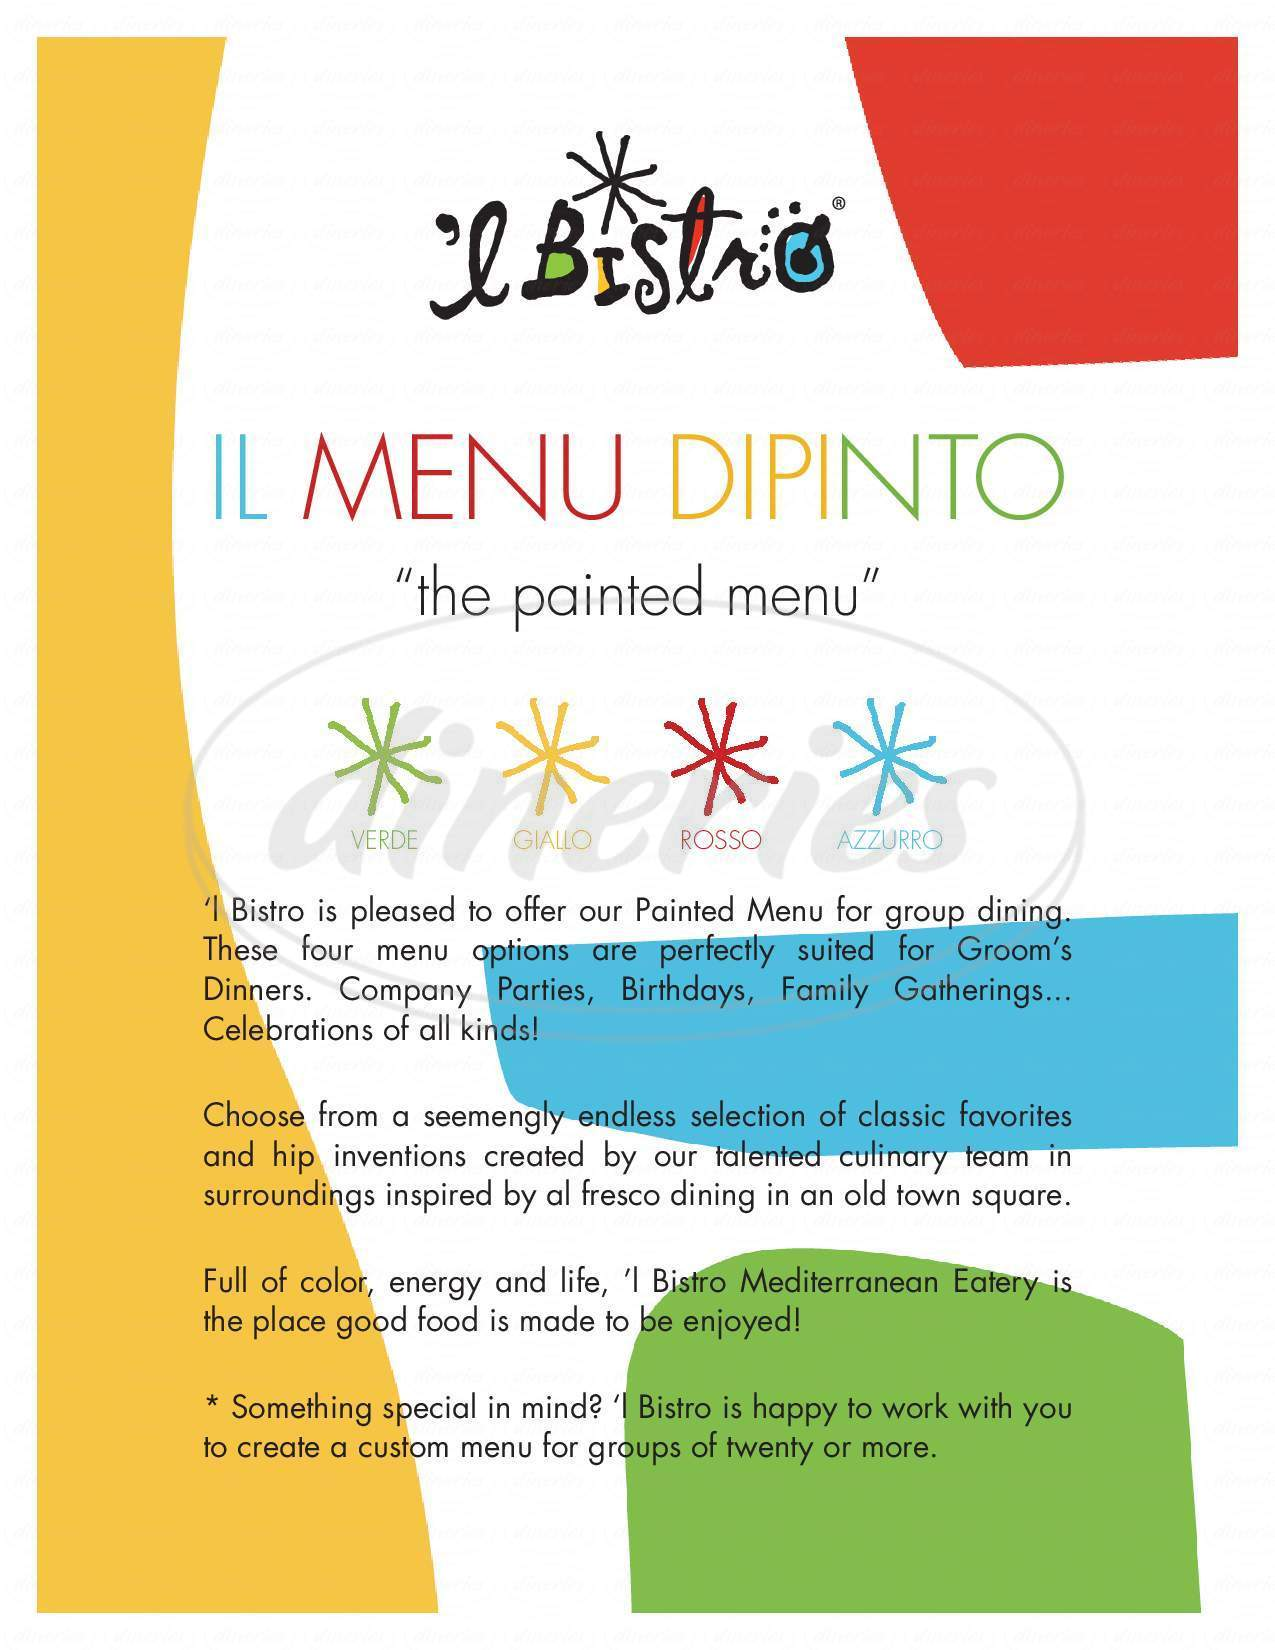 menu for L'Bistro